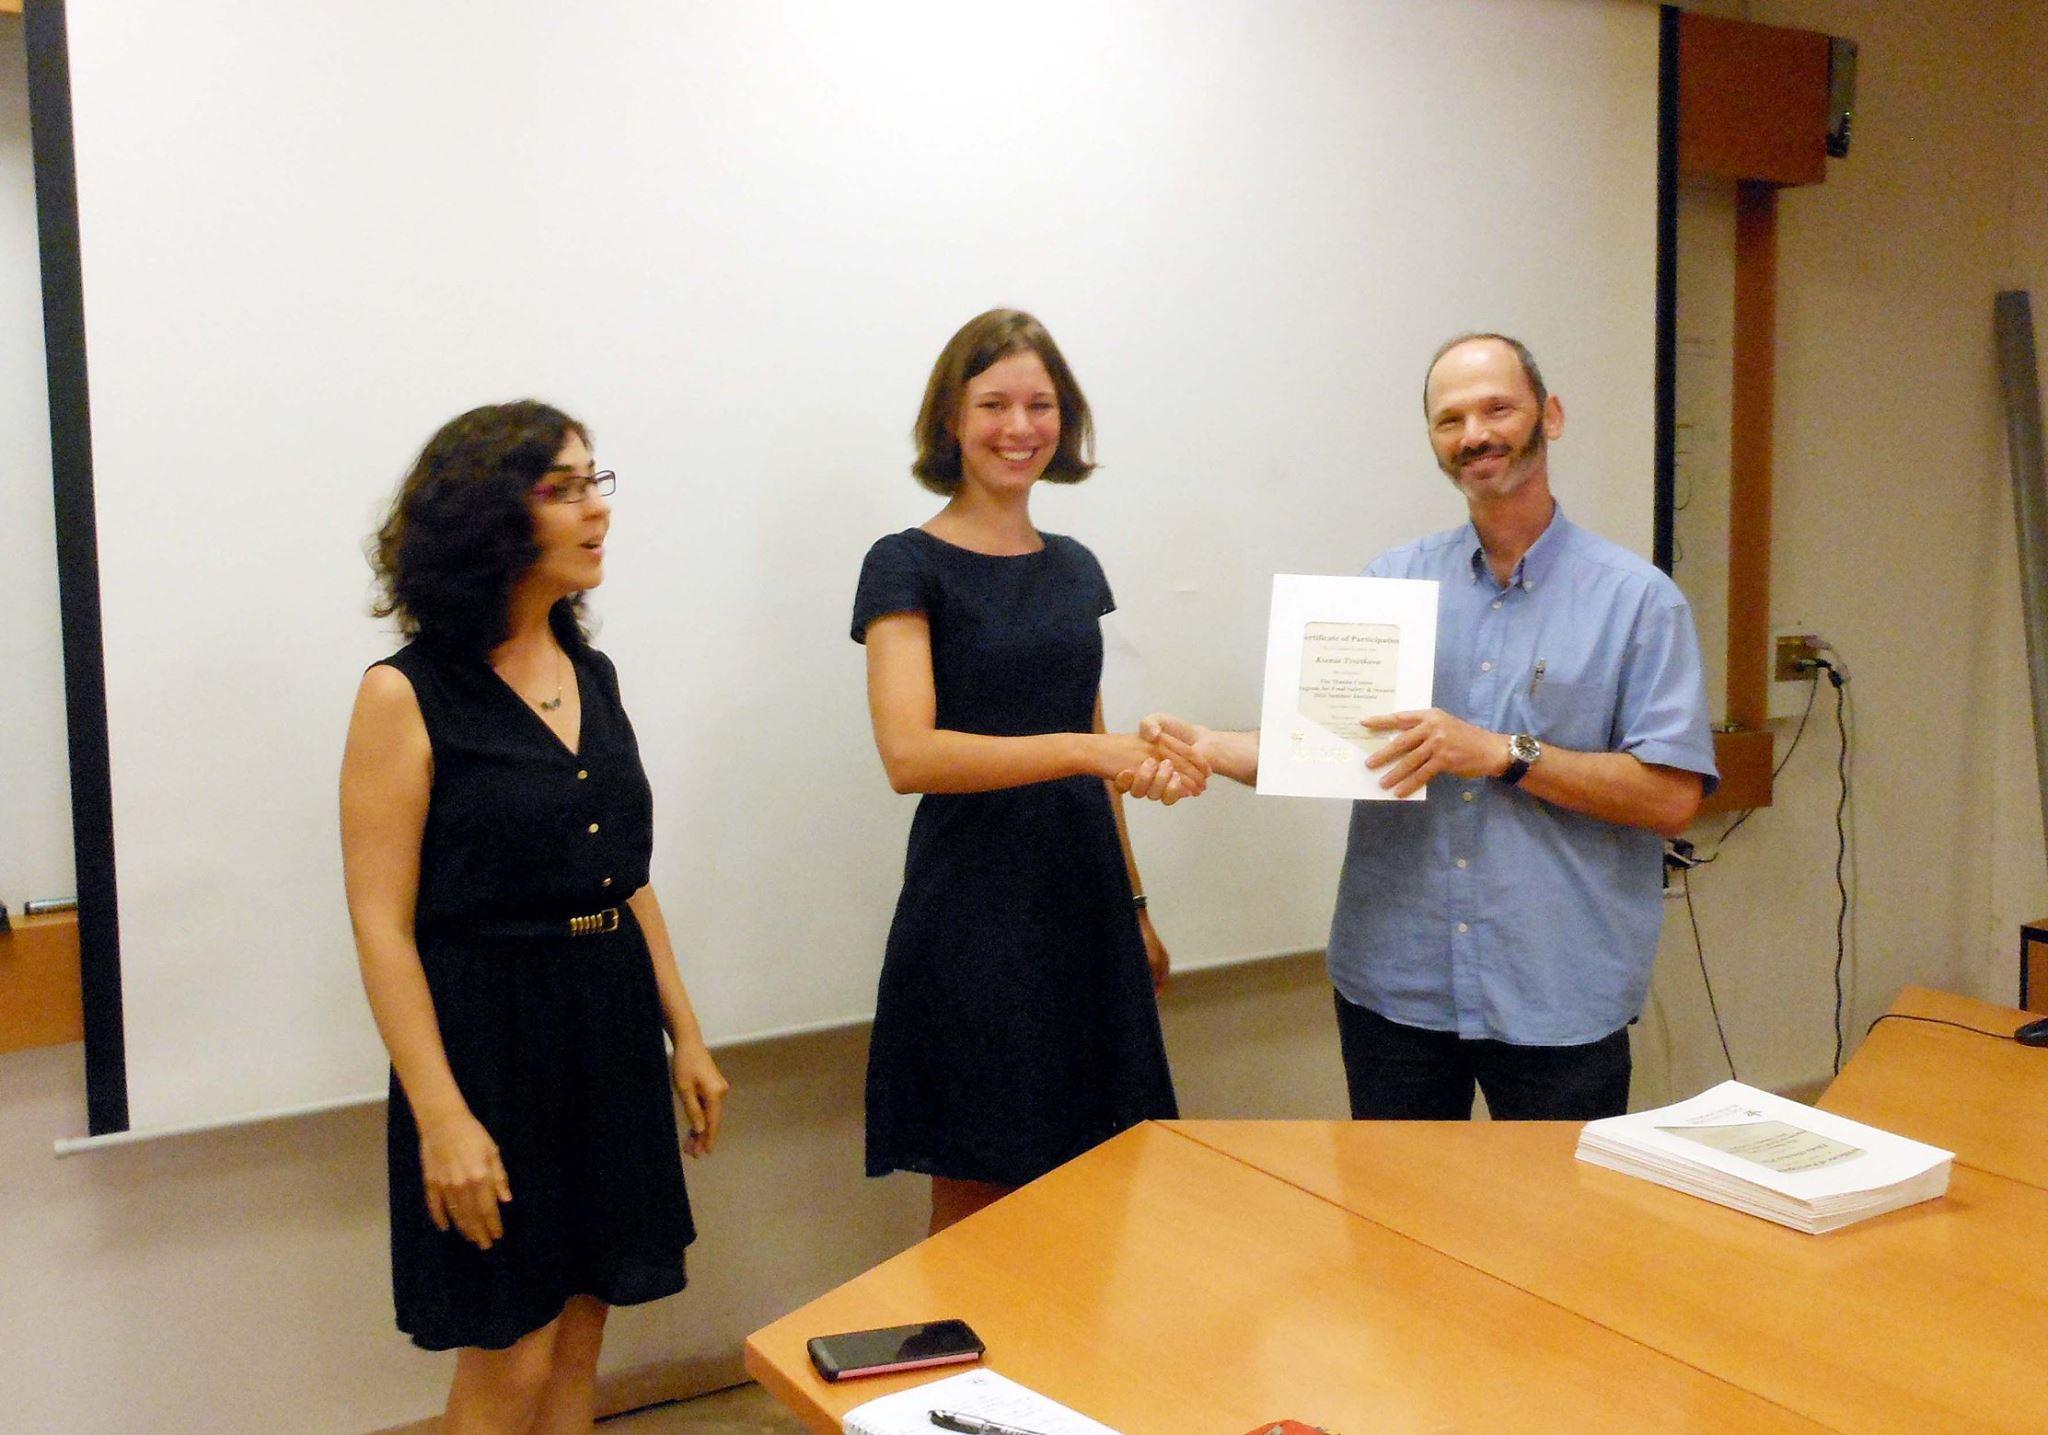 Ksenia Tsvetkova receives her diploma from the program director, Prof. Nir Ohad